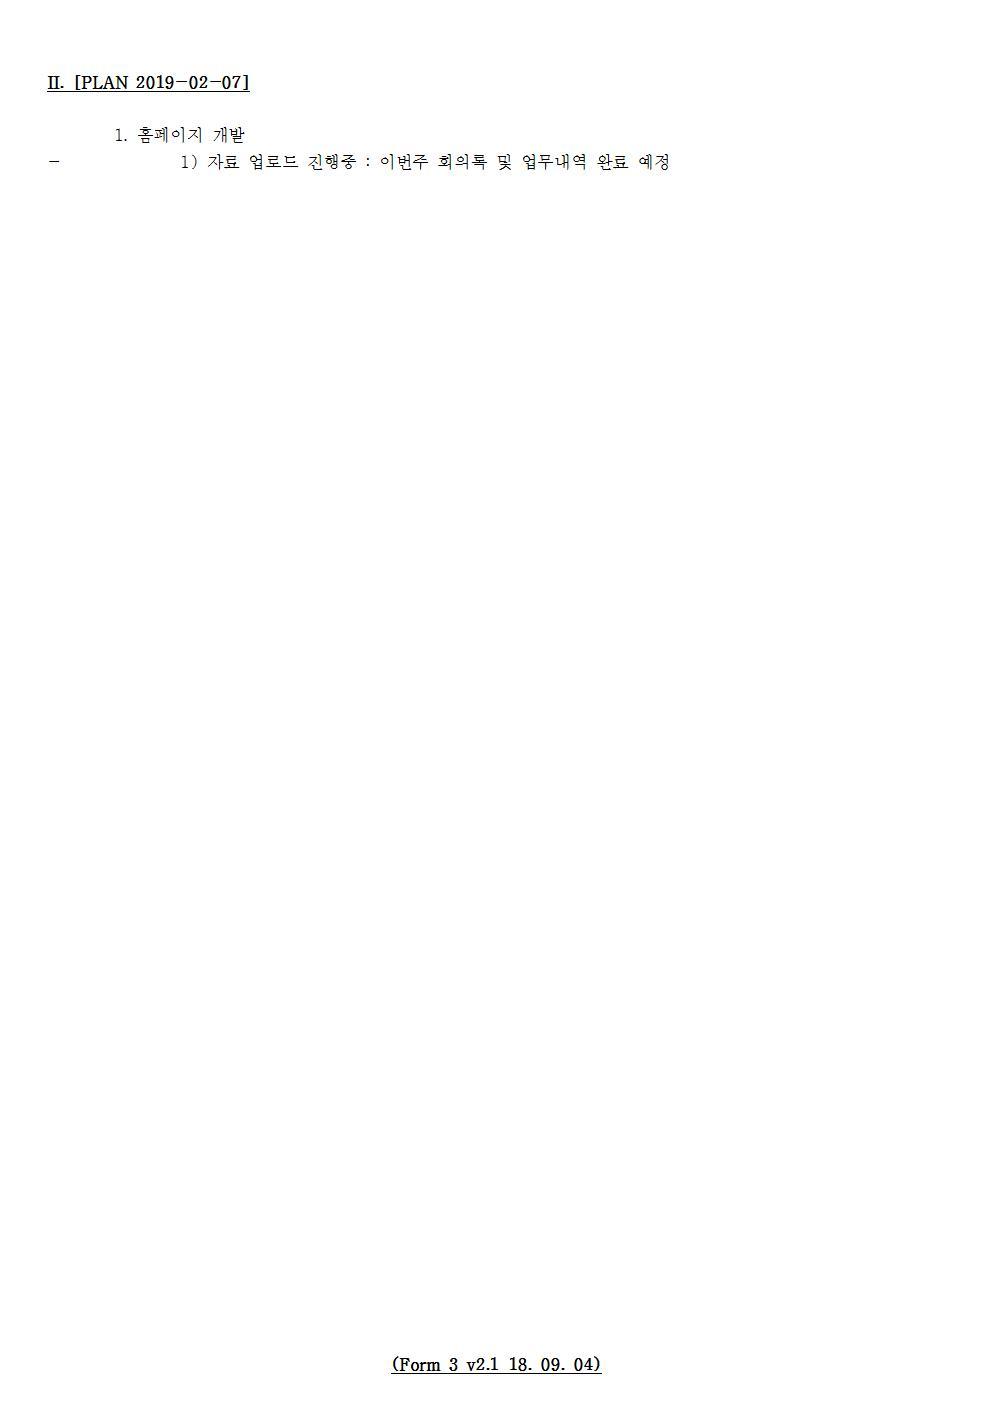 D-[19-021-RC-03]-[OKRCHP V2.0]-[2019-02-07][HH]002.jpg